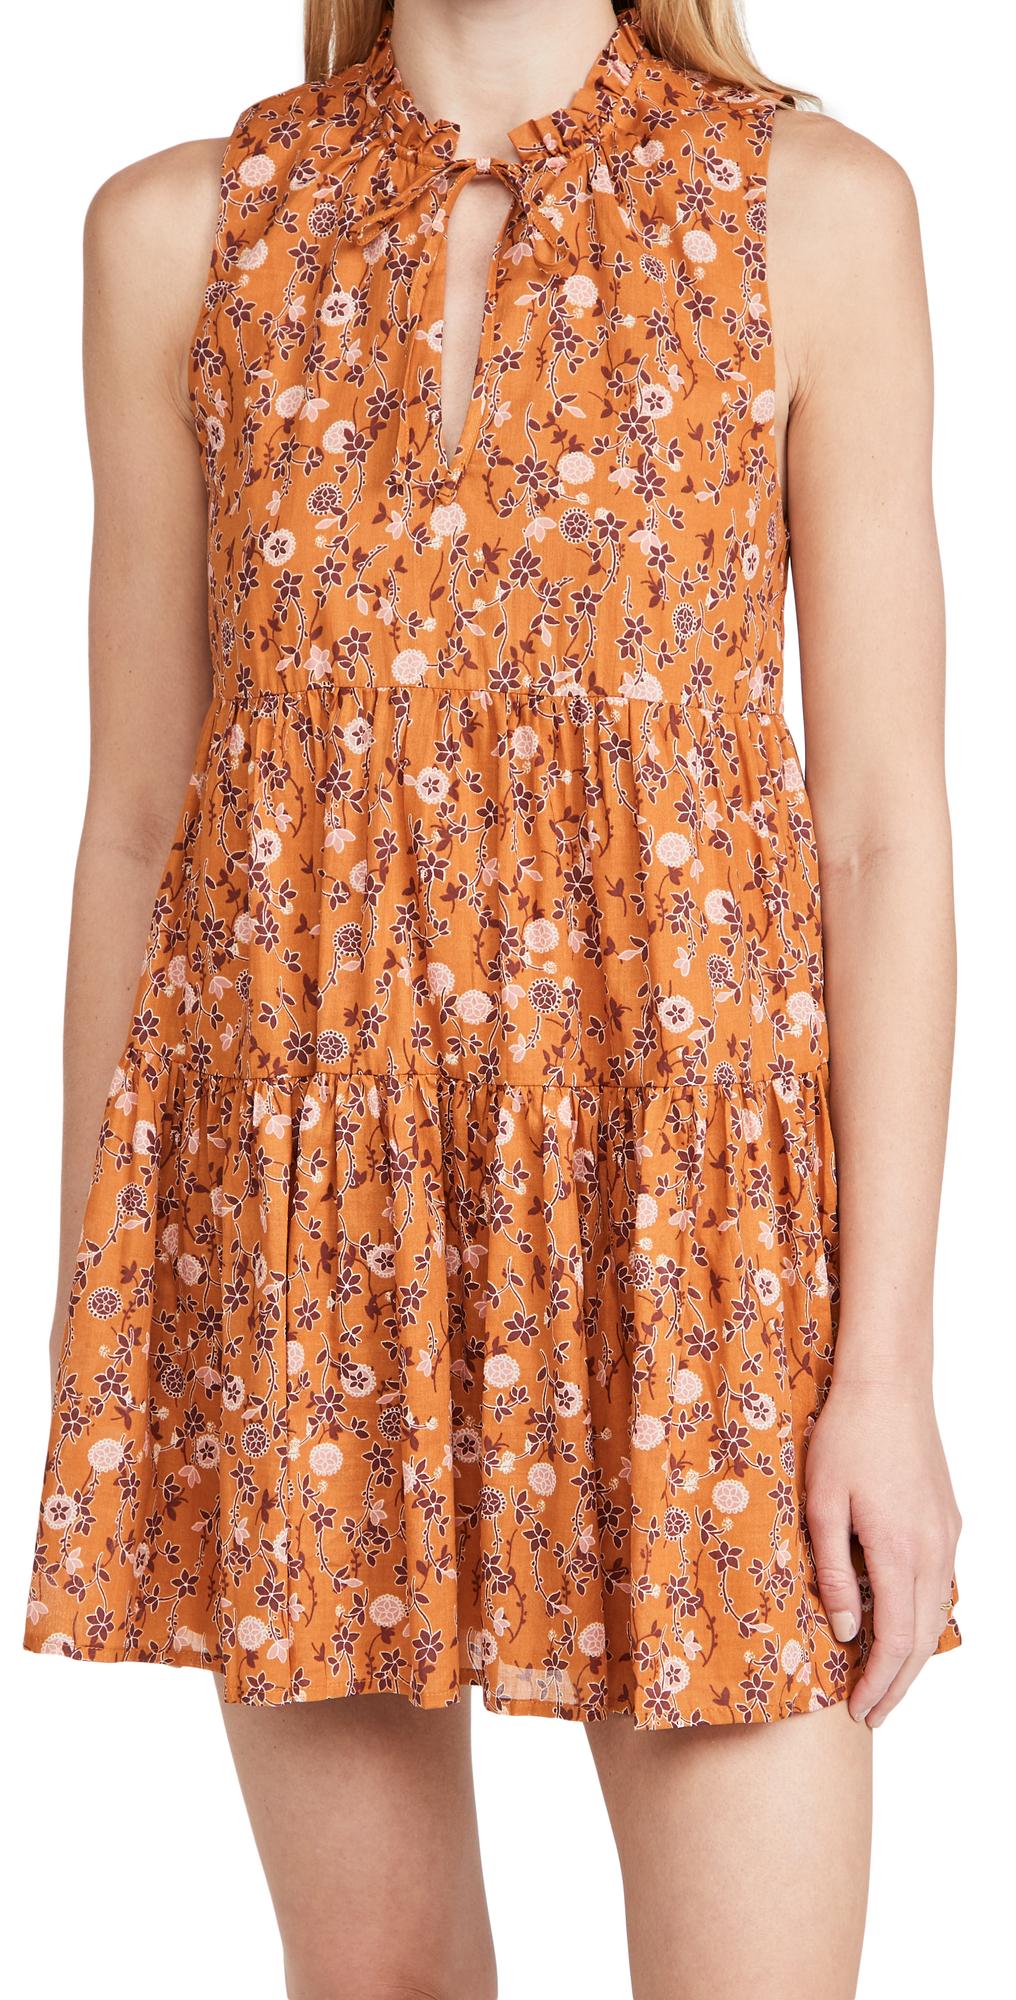 Sunny Disposition Dress